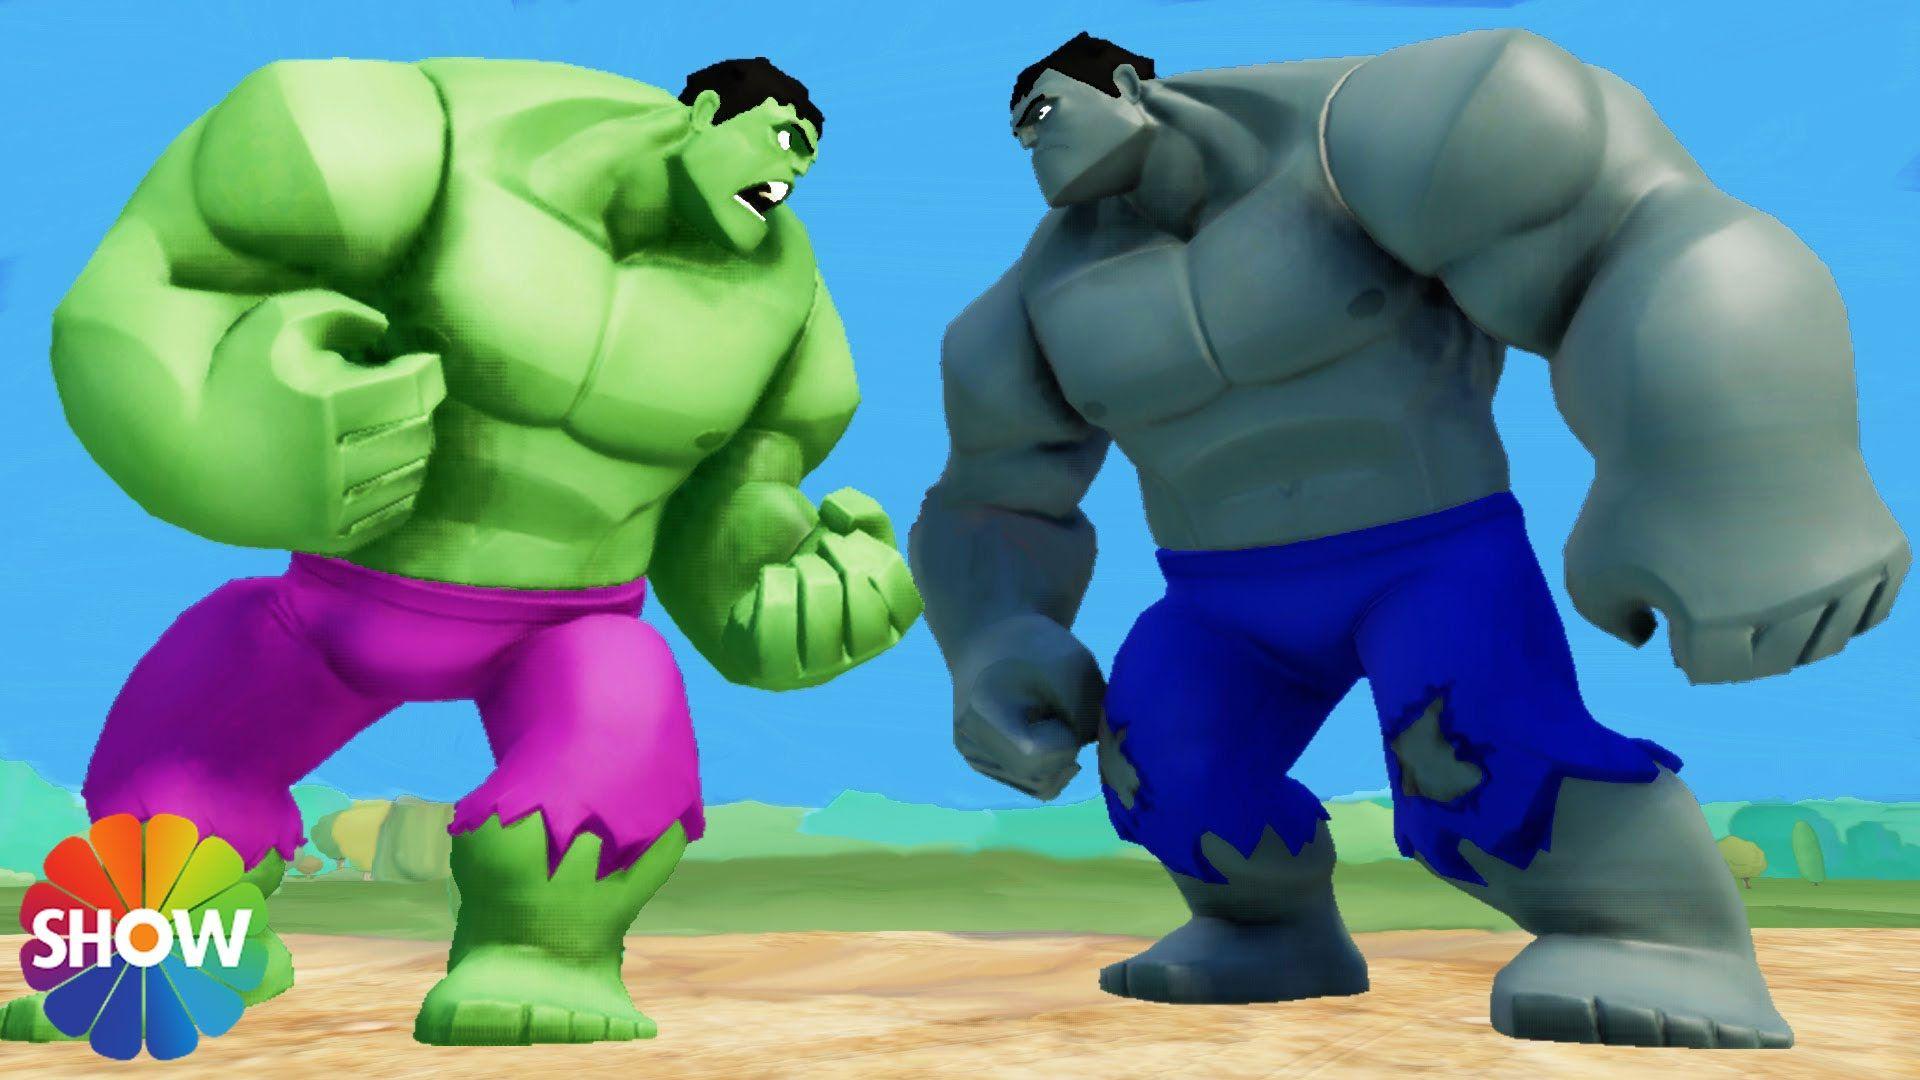 Uncategorized Hulk Videos For Kids spiderman hulk mcqueen funny disney video kids songs songs